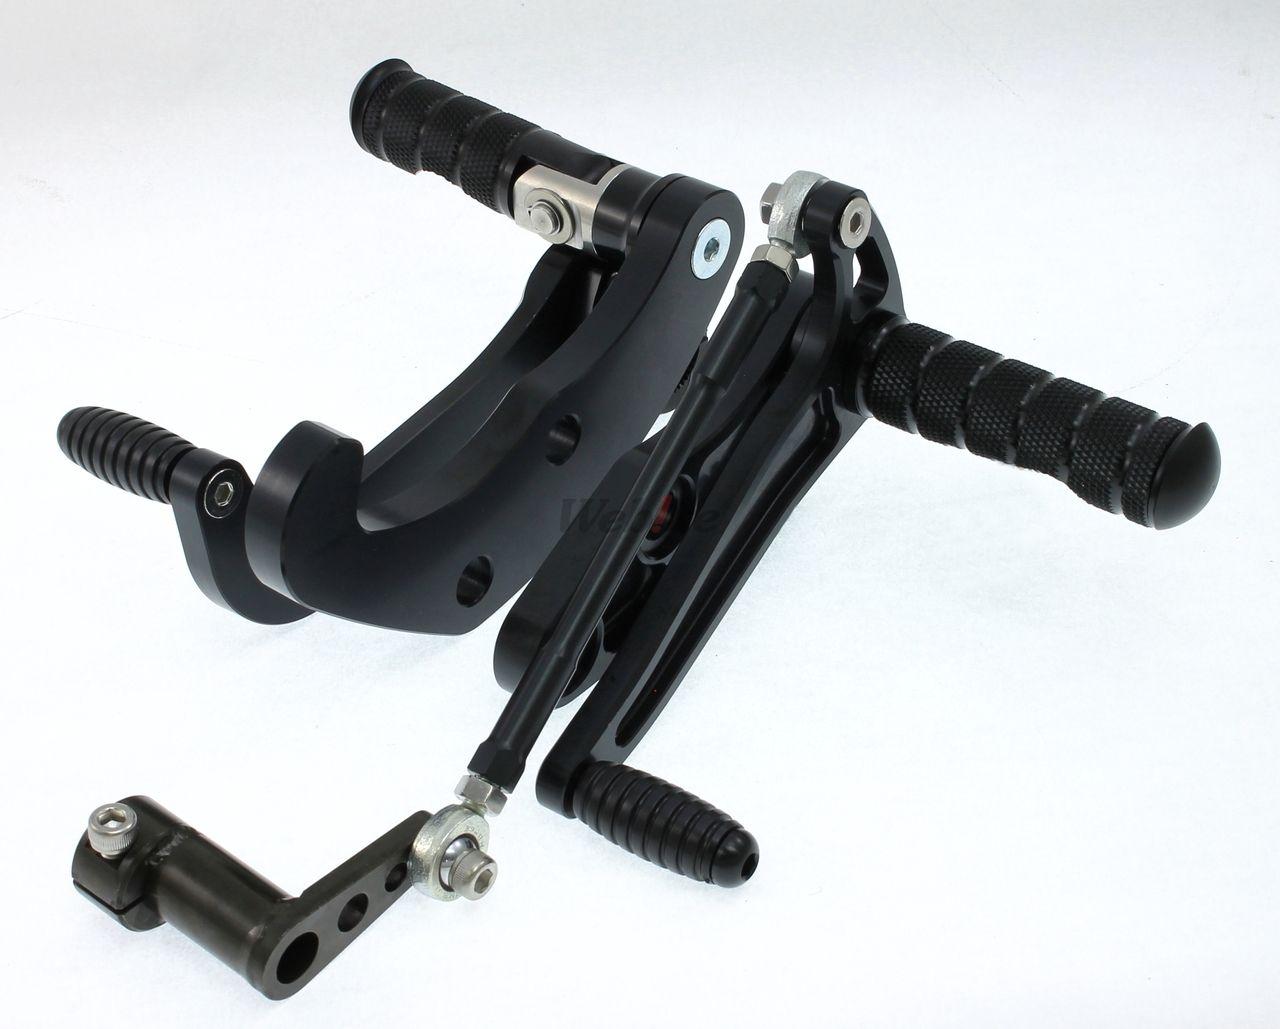 【CRAFTMAN】SR用 腳踏後移套件 (STD後鼓煞型式) - 「Webike-摩托百貨」